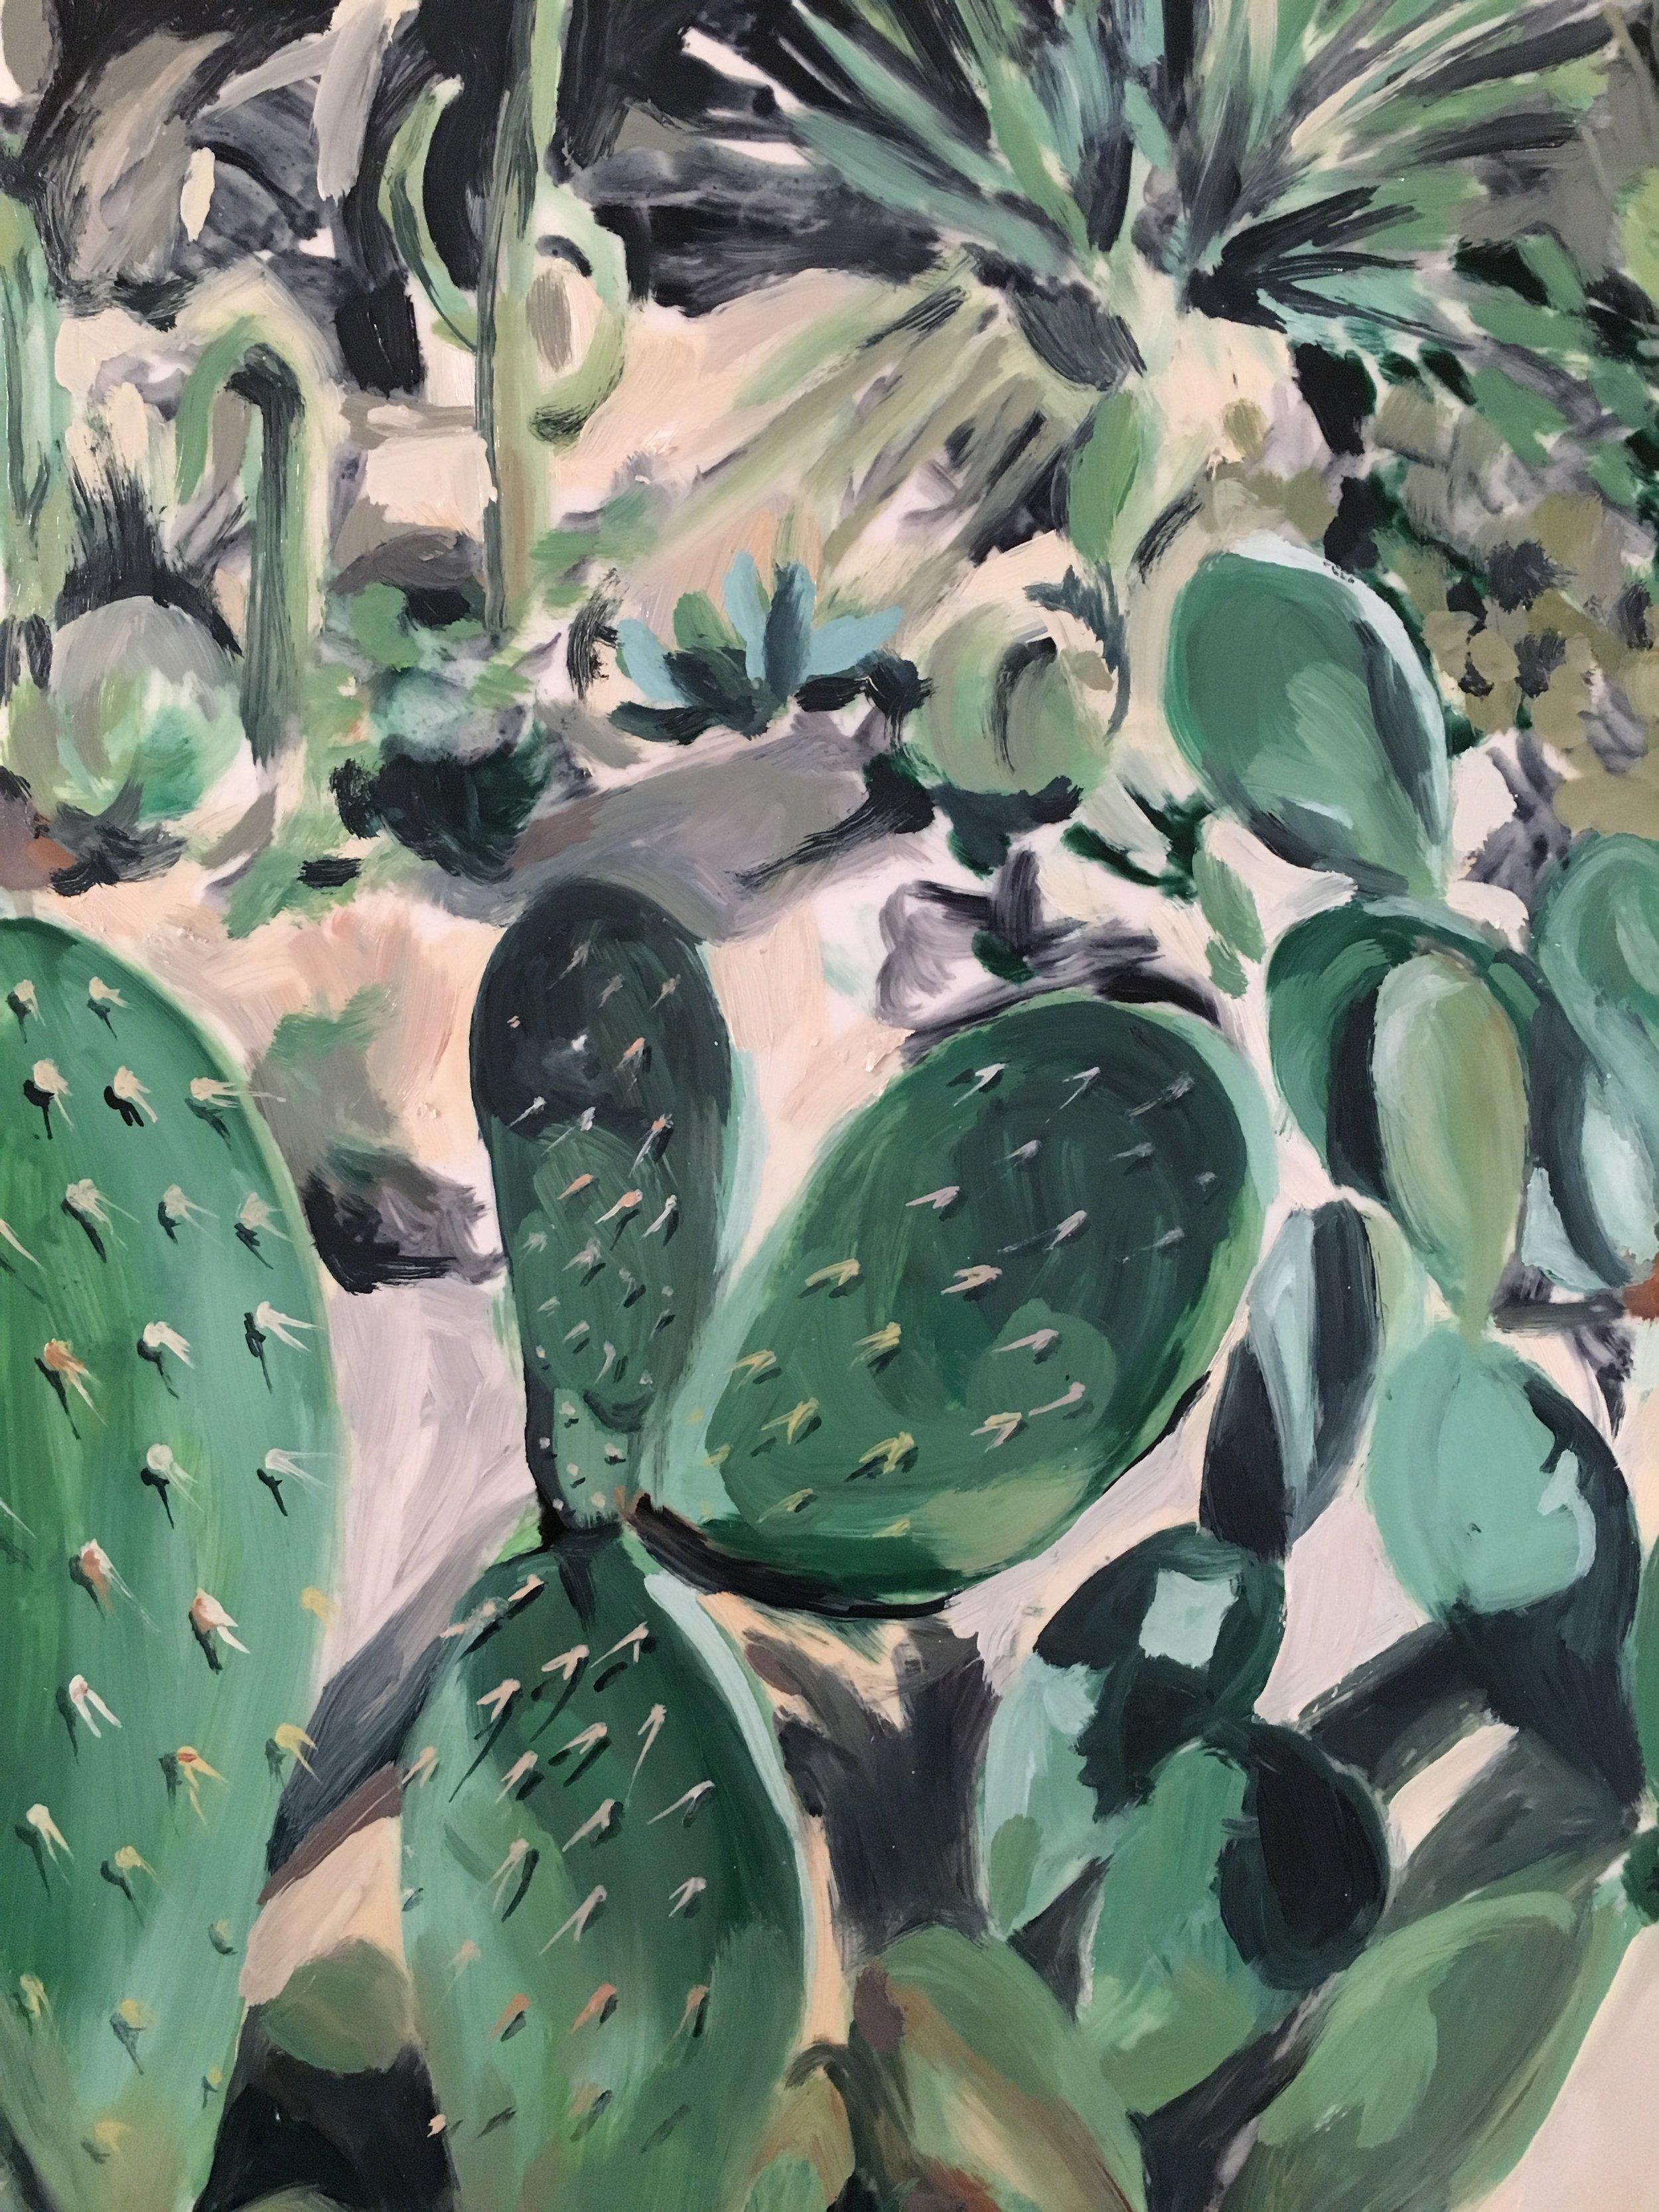 "Plants in Captivity No. 4 | Oil on Duralar | 11 x 14"" L"